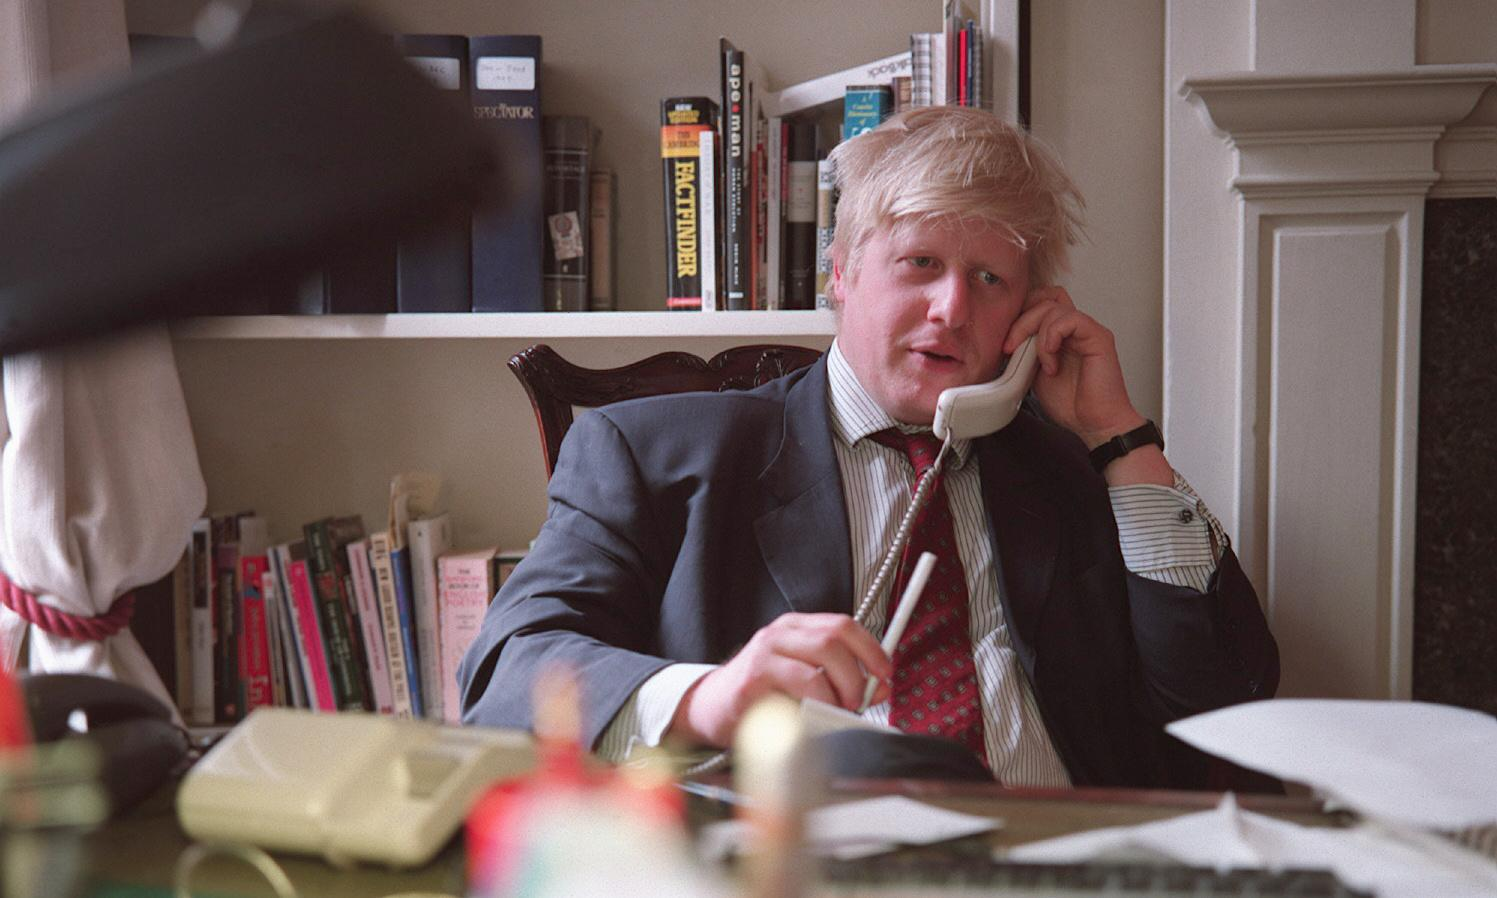 Beware Boris Johnson's lust for the limelight and power